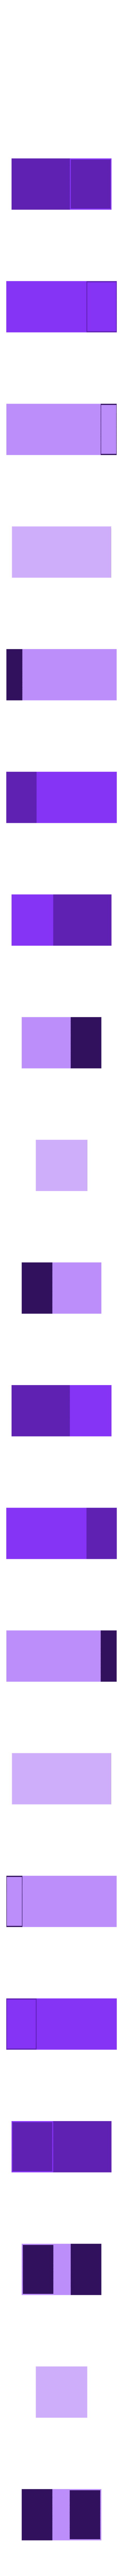 tardis box interieur.stl Download STL file tardis (table bin, box, etc...) • 3D print model, YOHAN_3D